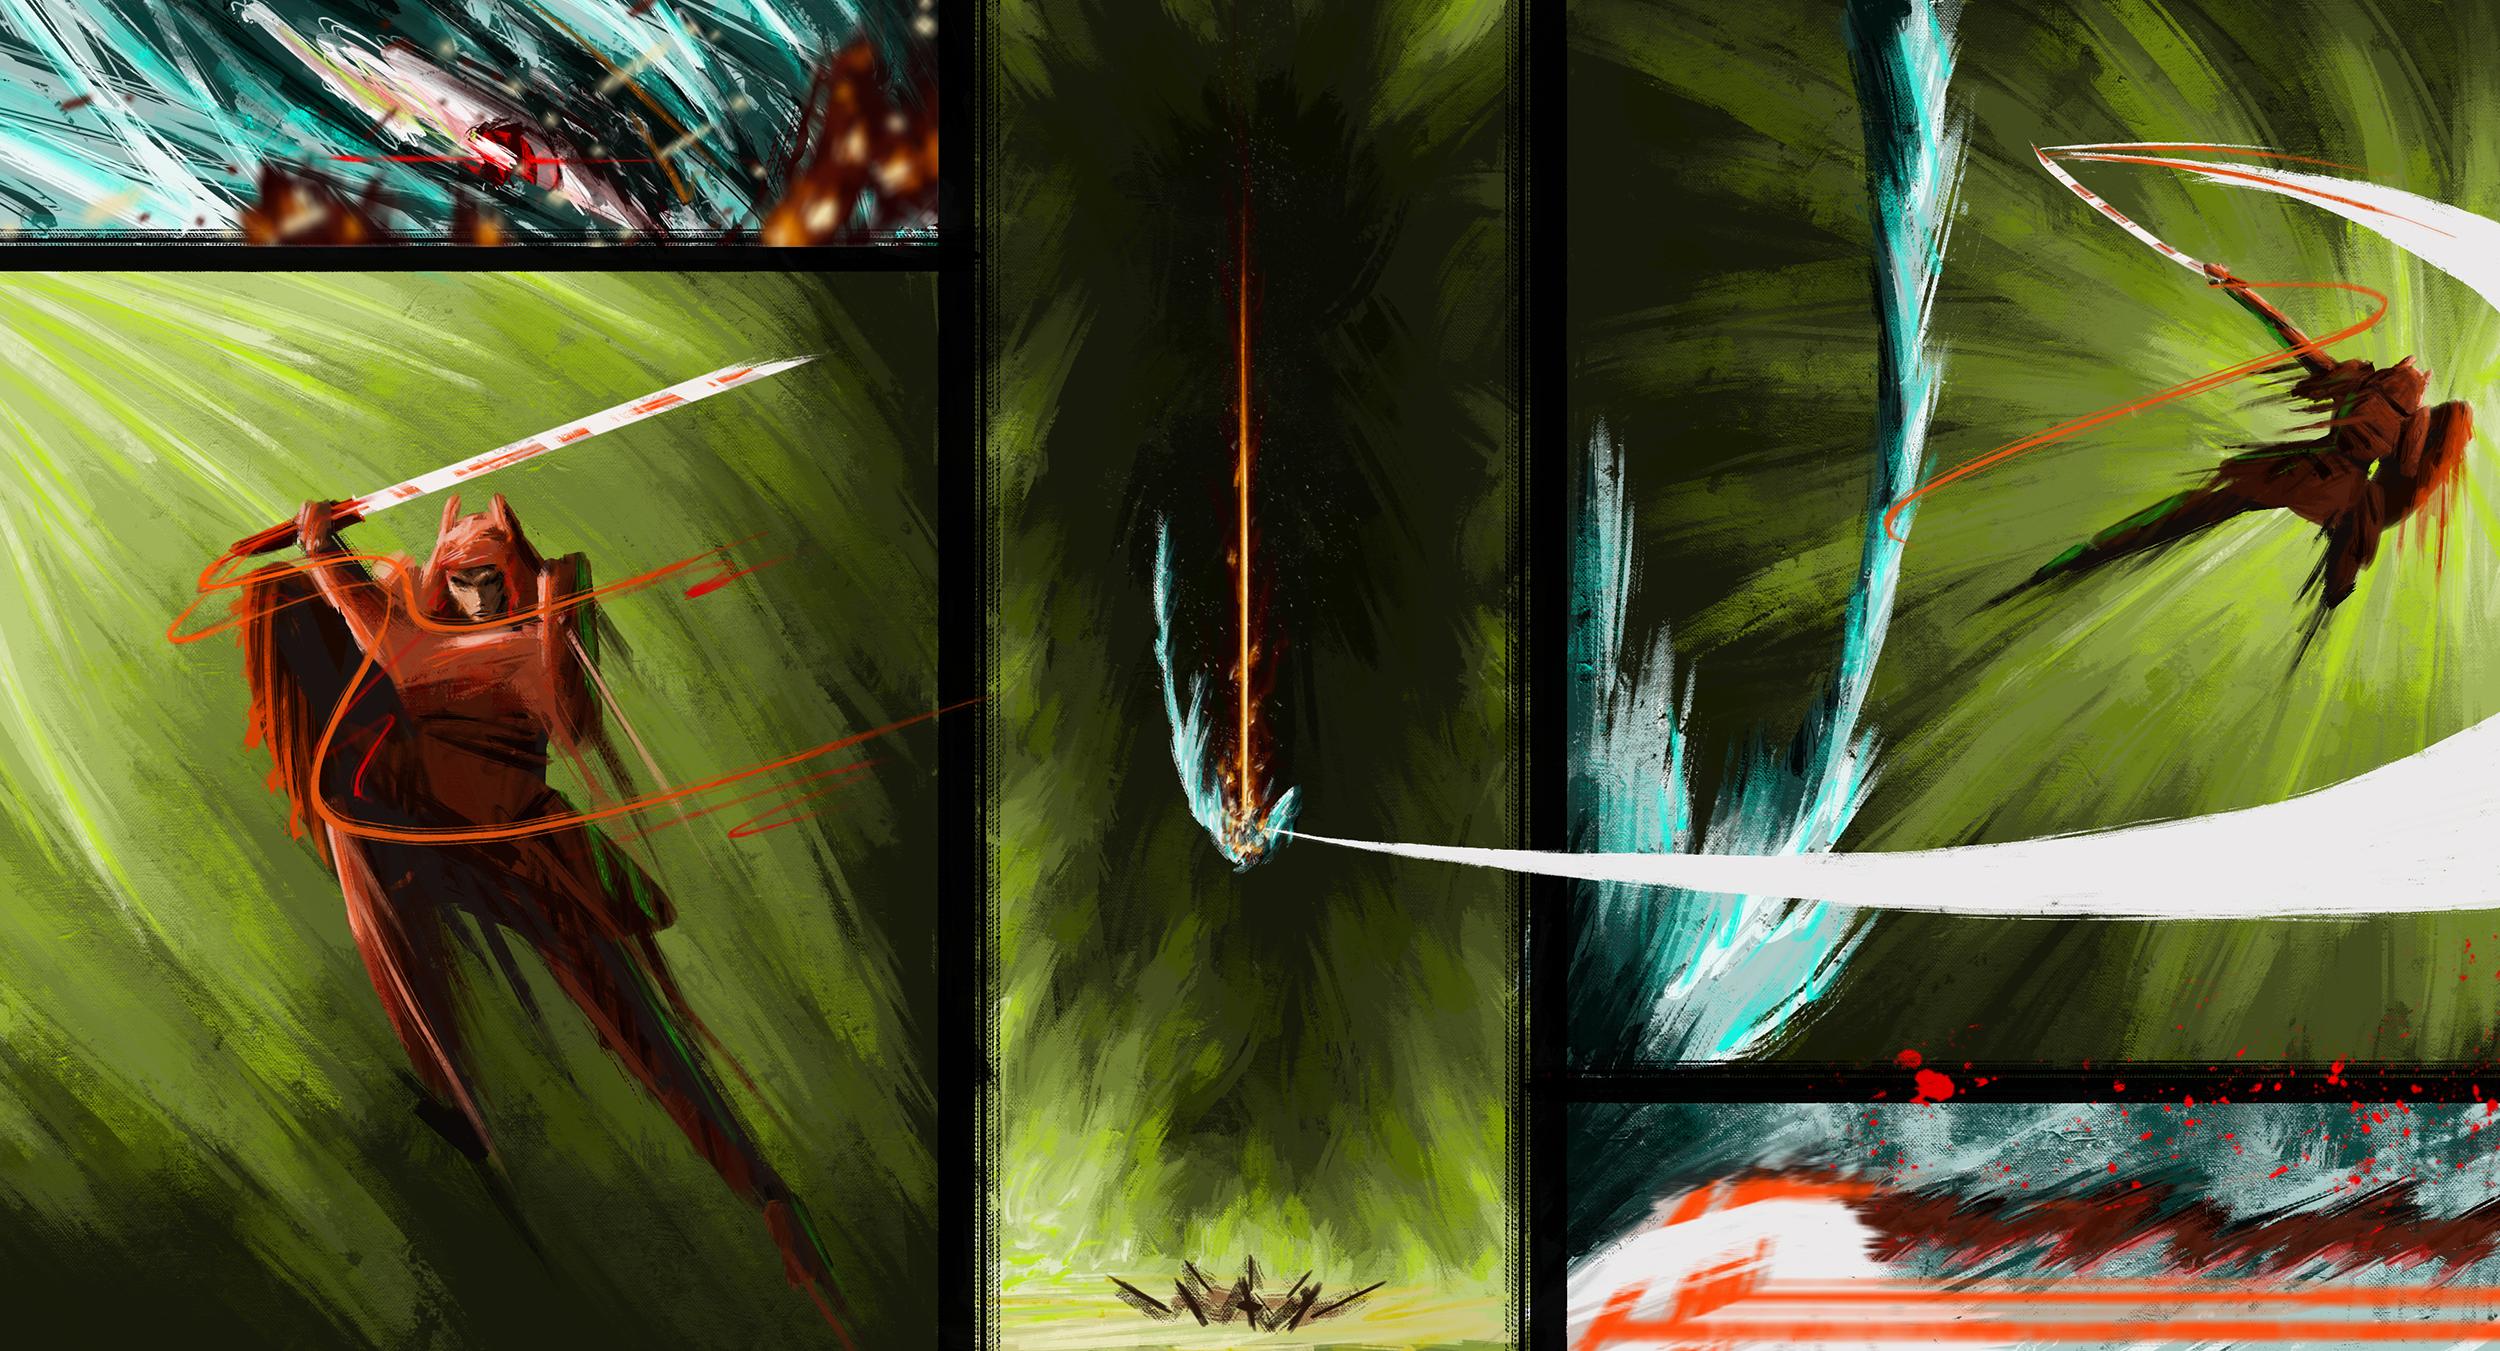 Cut - 04 - The Pillar's Beast II